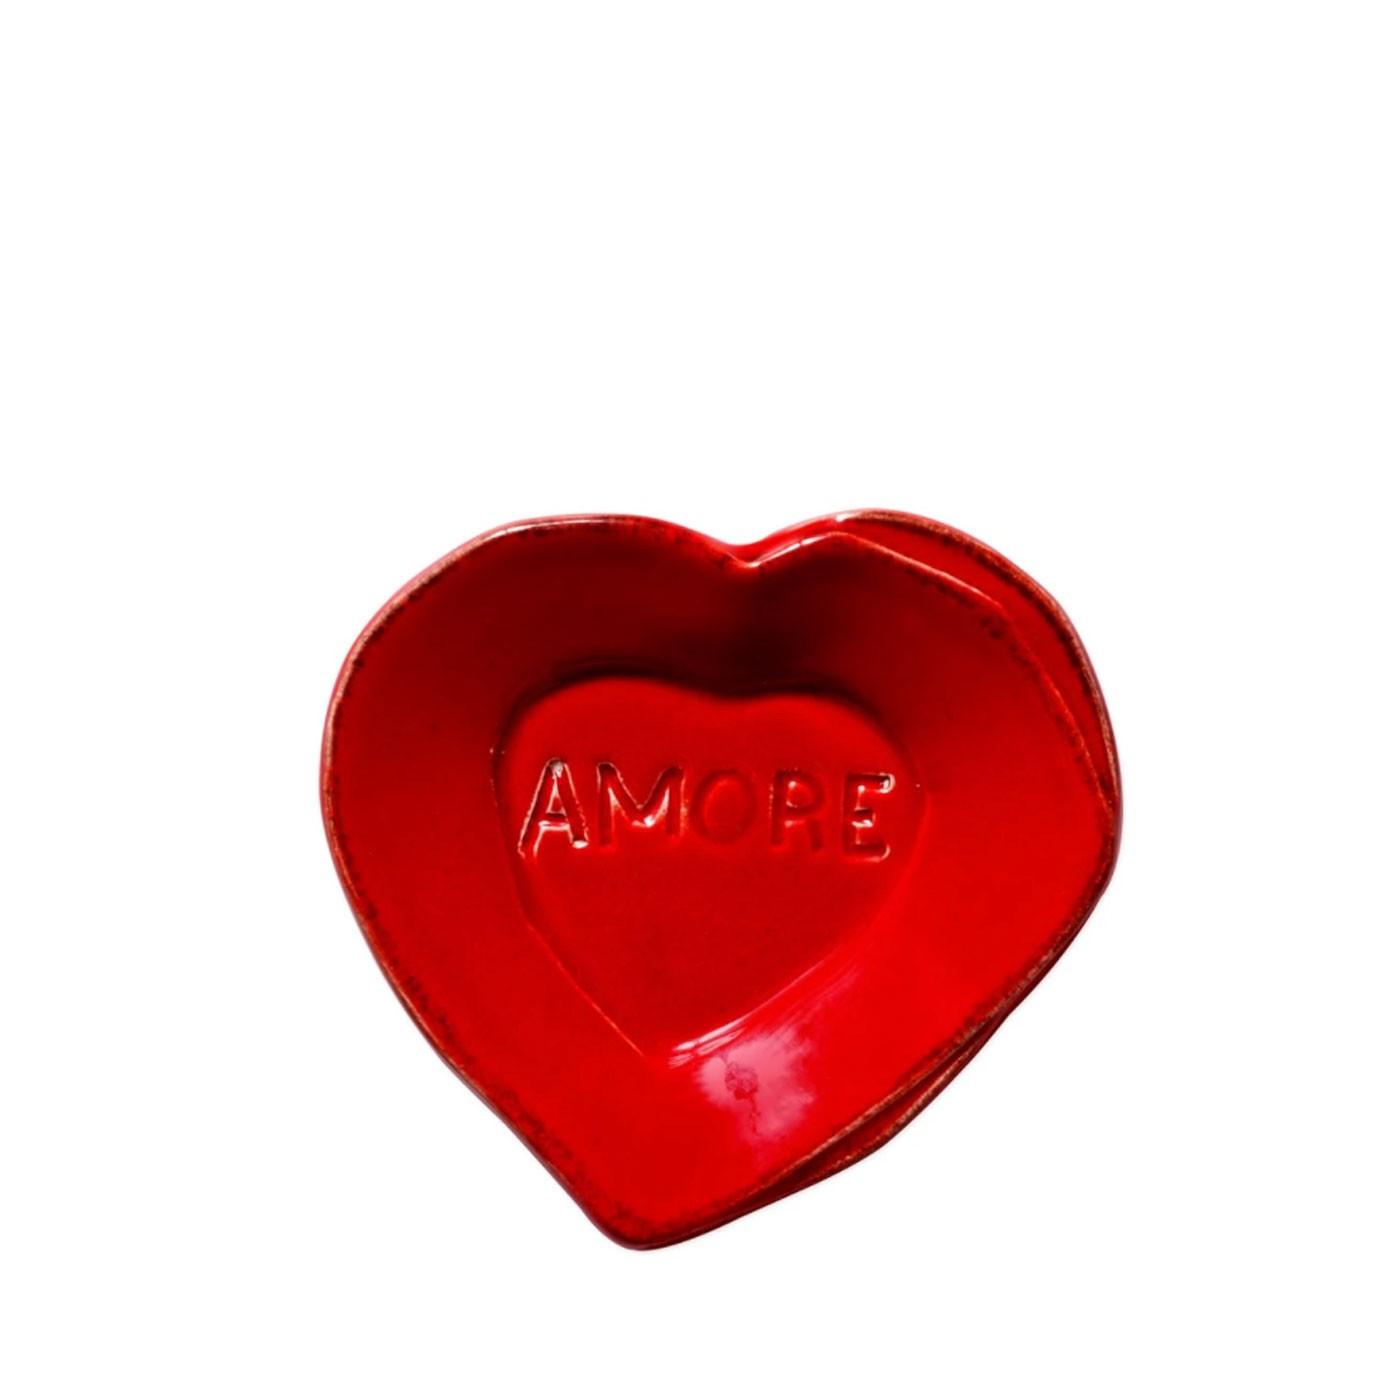 Lastra Red Heart Mini Amore Plate - Vietri   Eataly.com